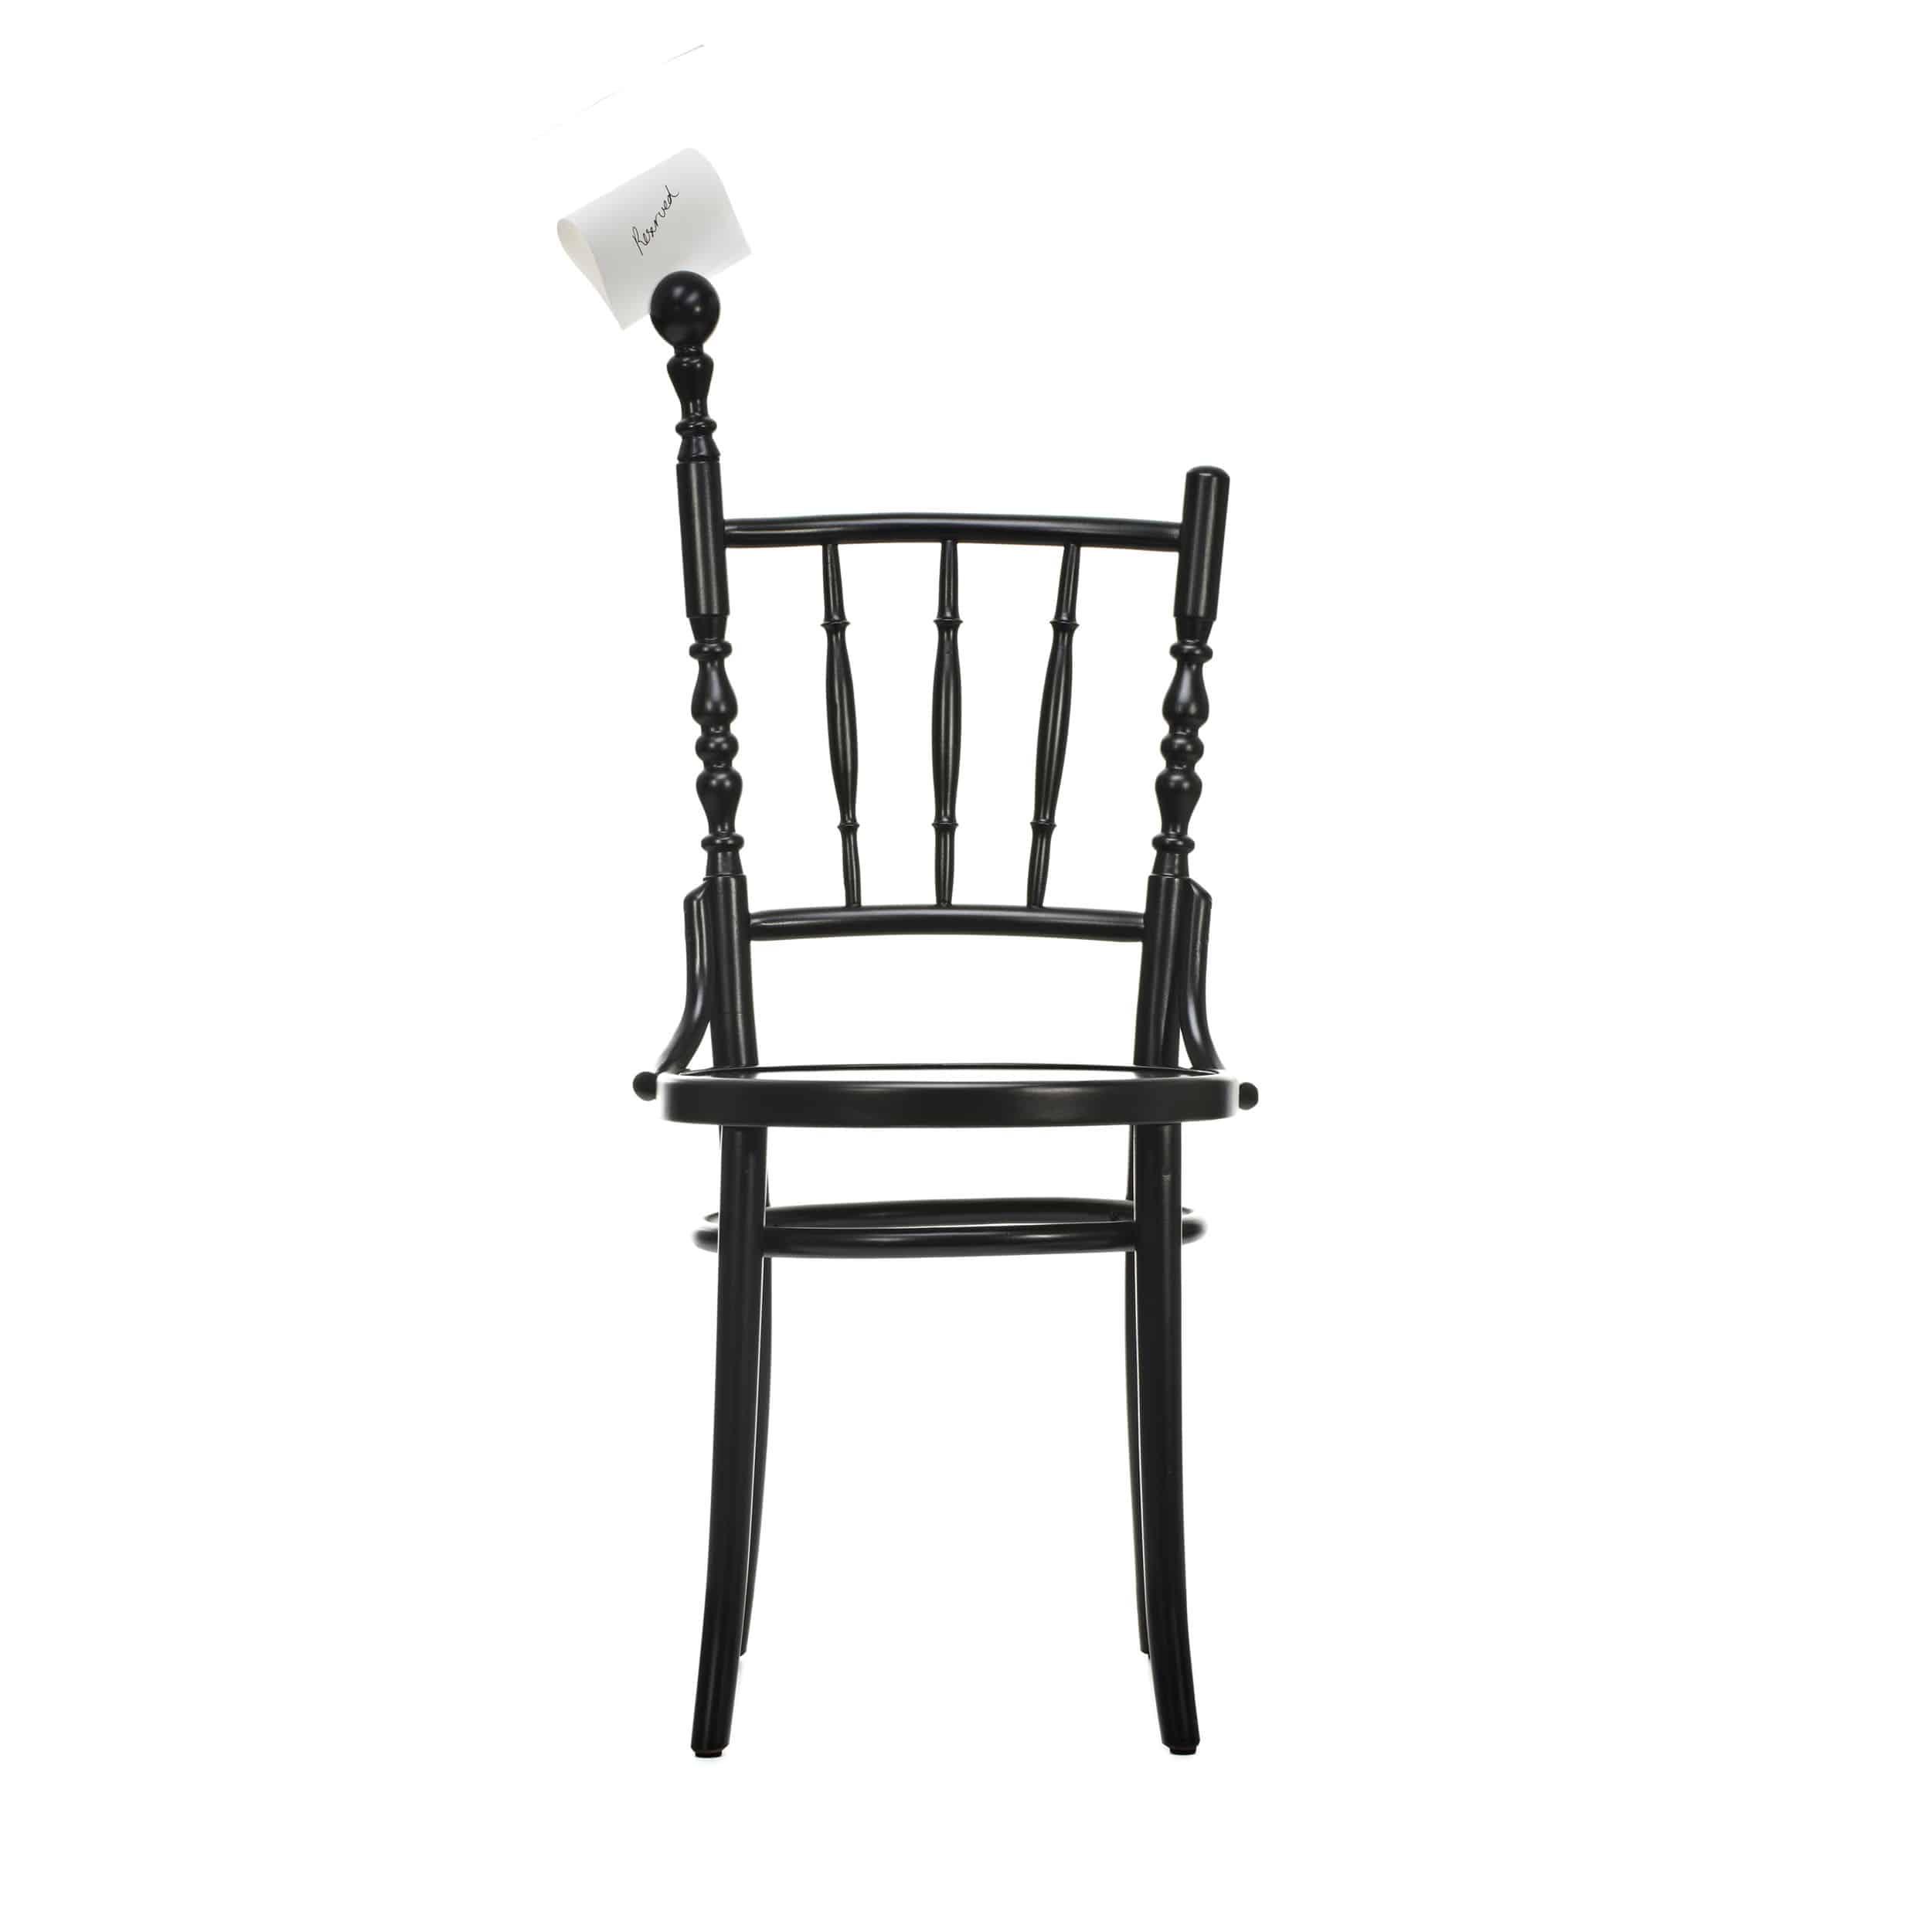 Extension Chair Stuhl mit Visitenkartenhalter